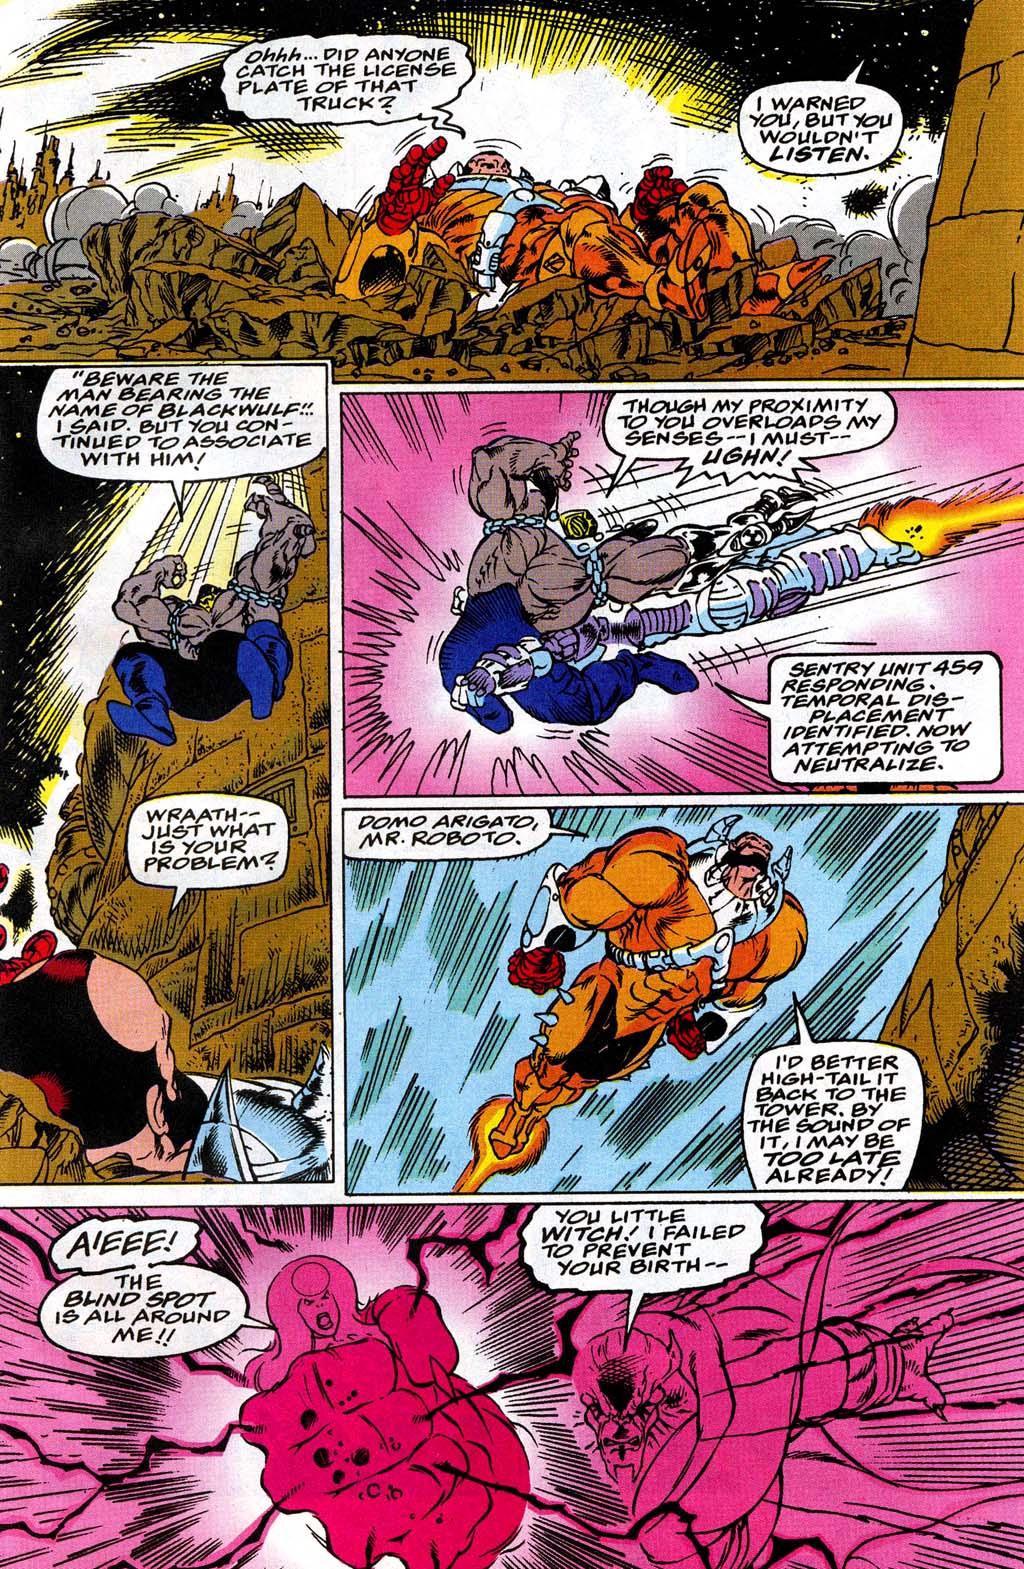 Read online Blackwulf comic -  Issue #10 - 10